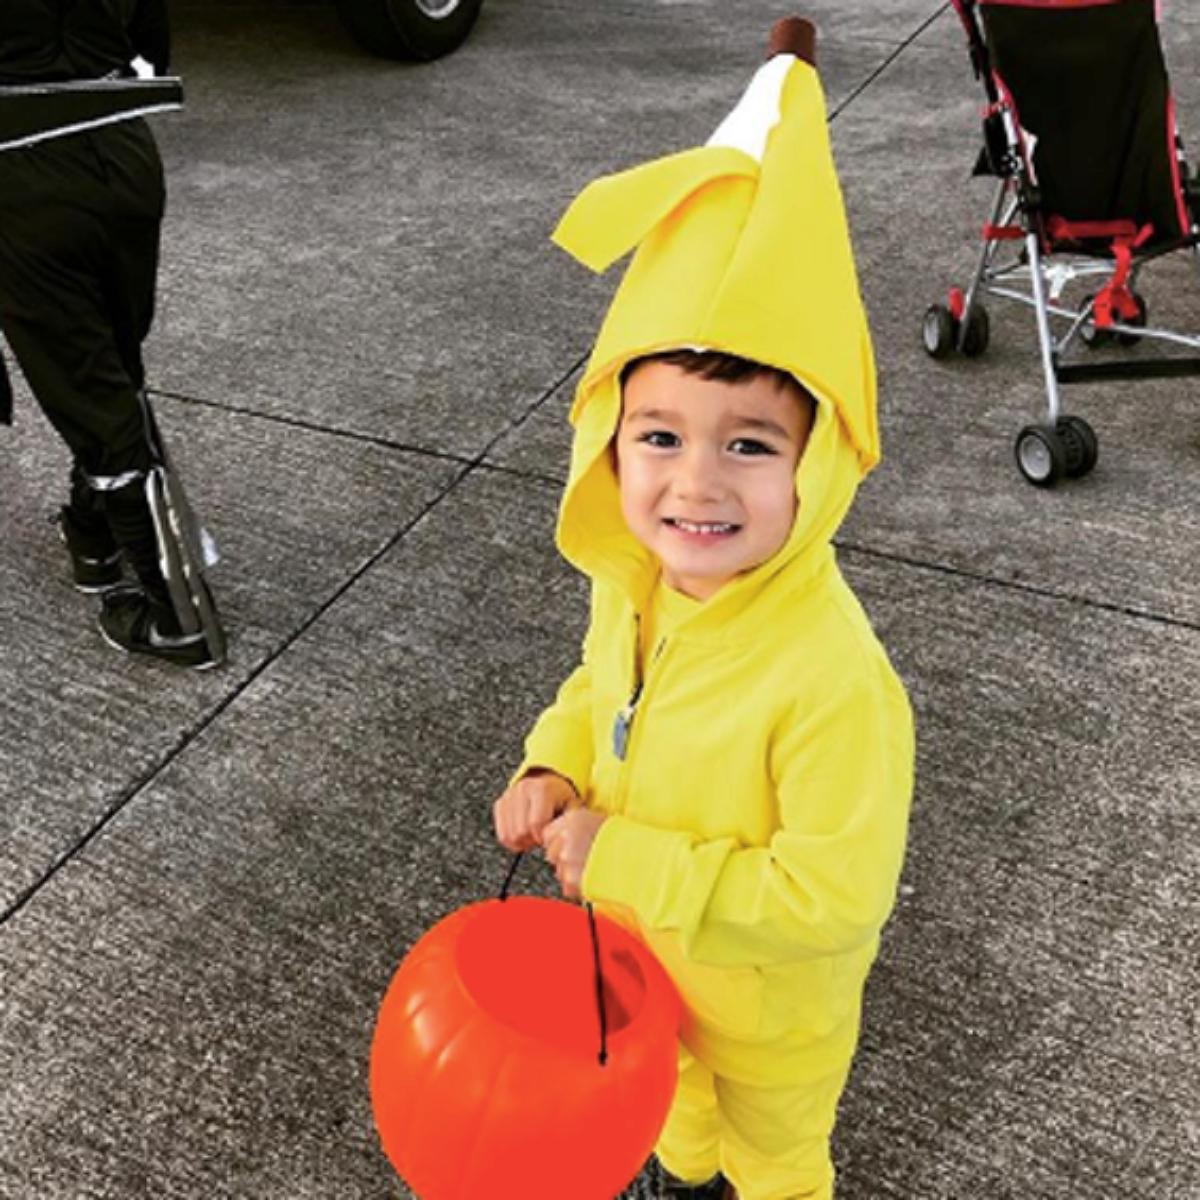 No sew diy kids and baby costumes primary no sew diy banana food costume primary solutioingenieria Choice Image